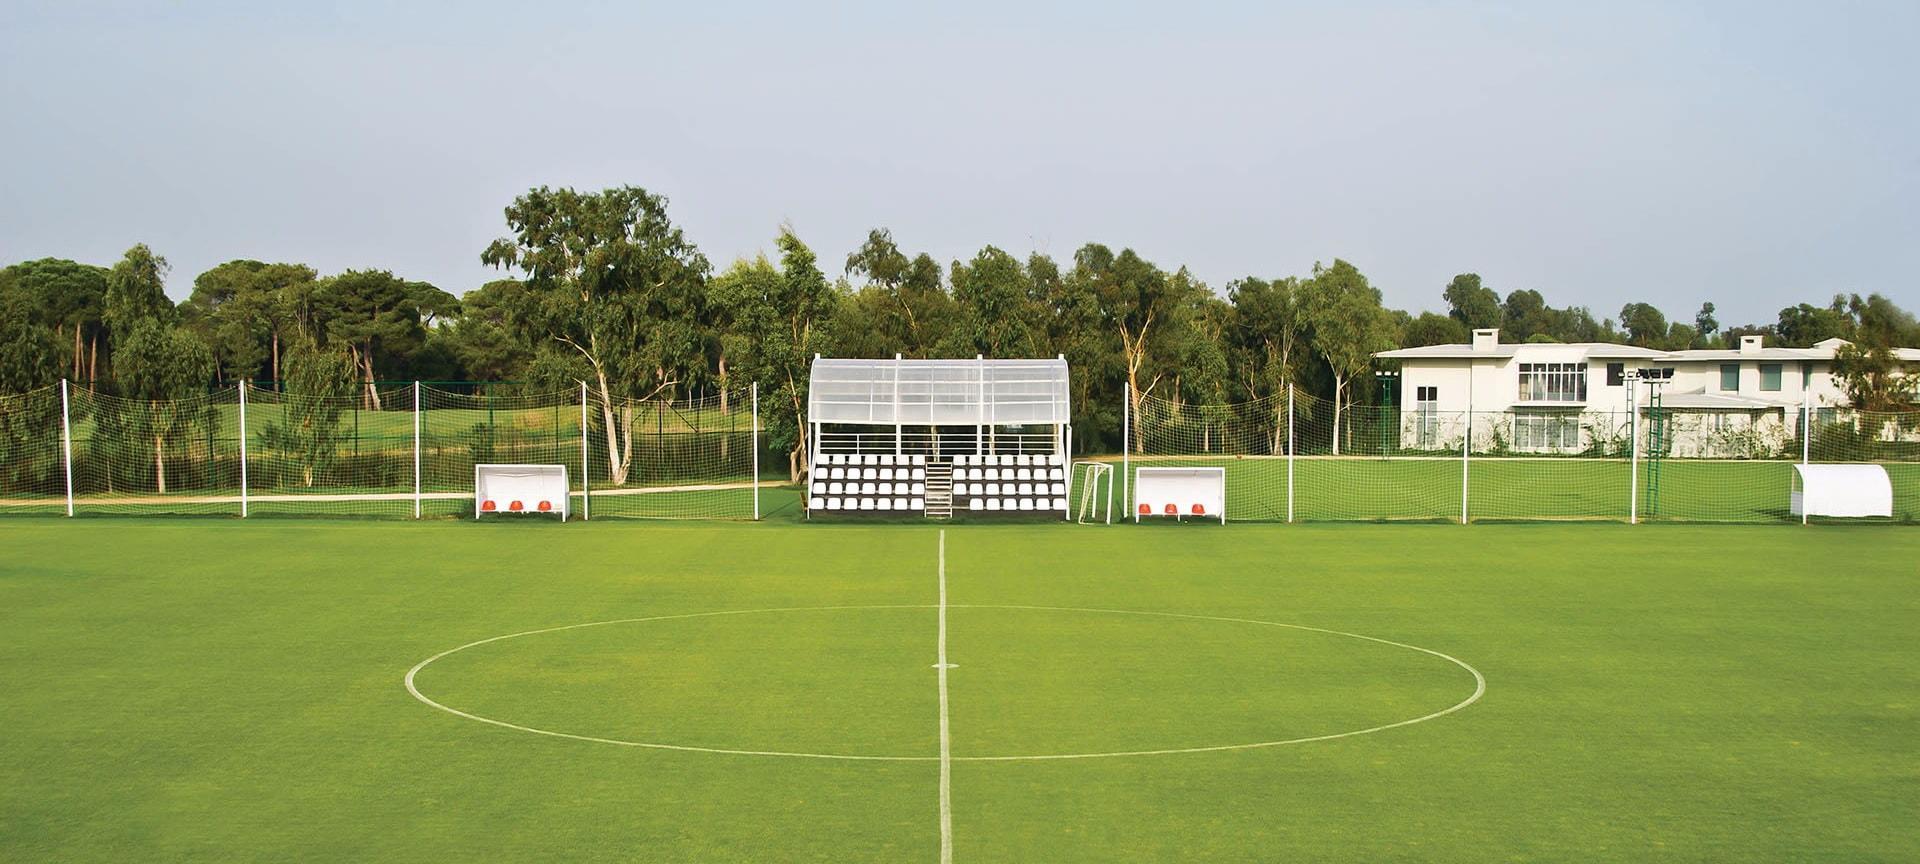 Отель Корнелия Белек для футбола